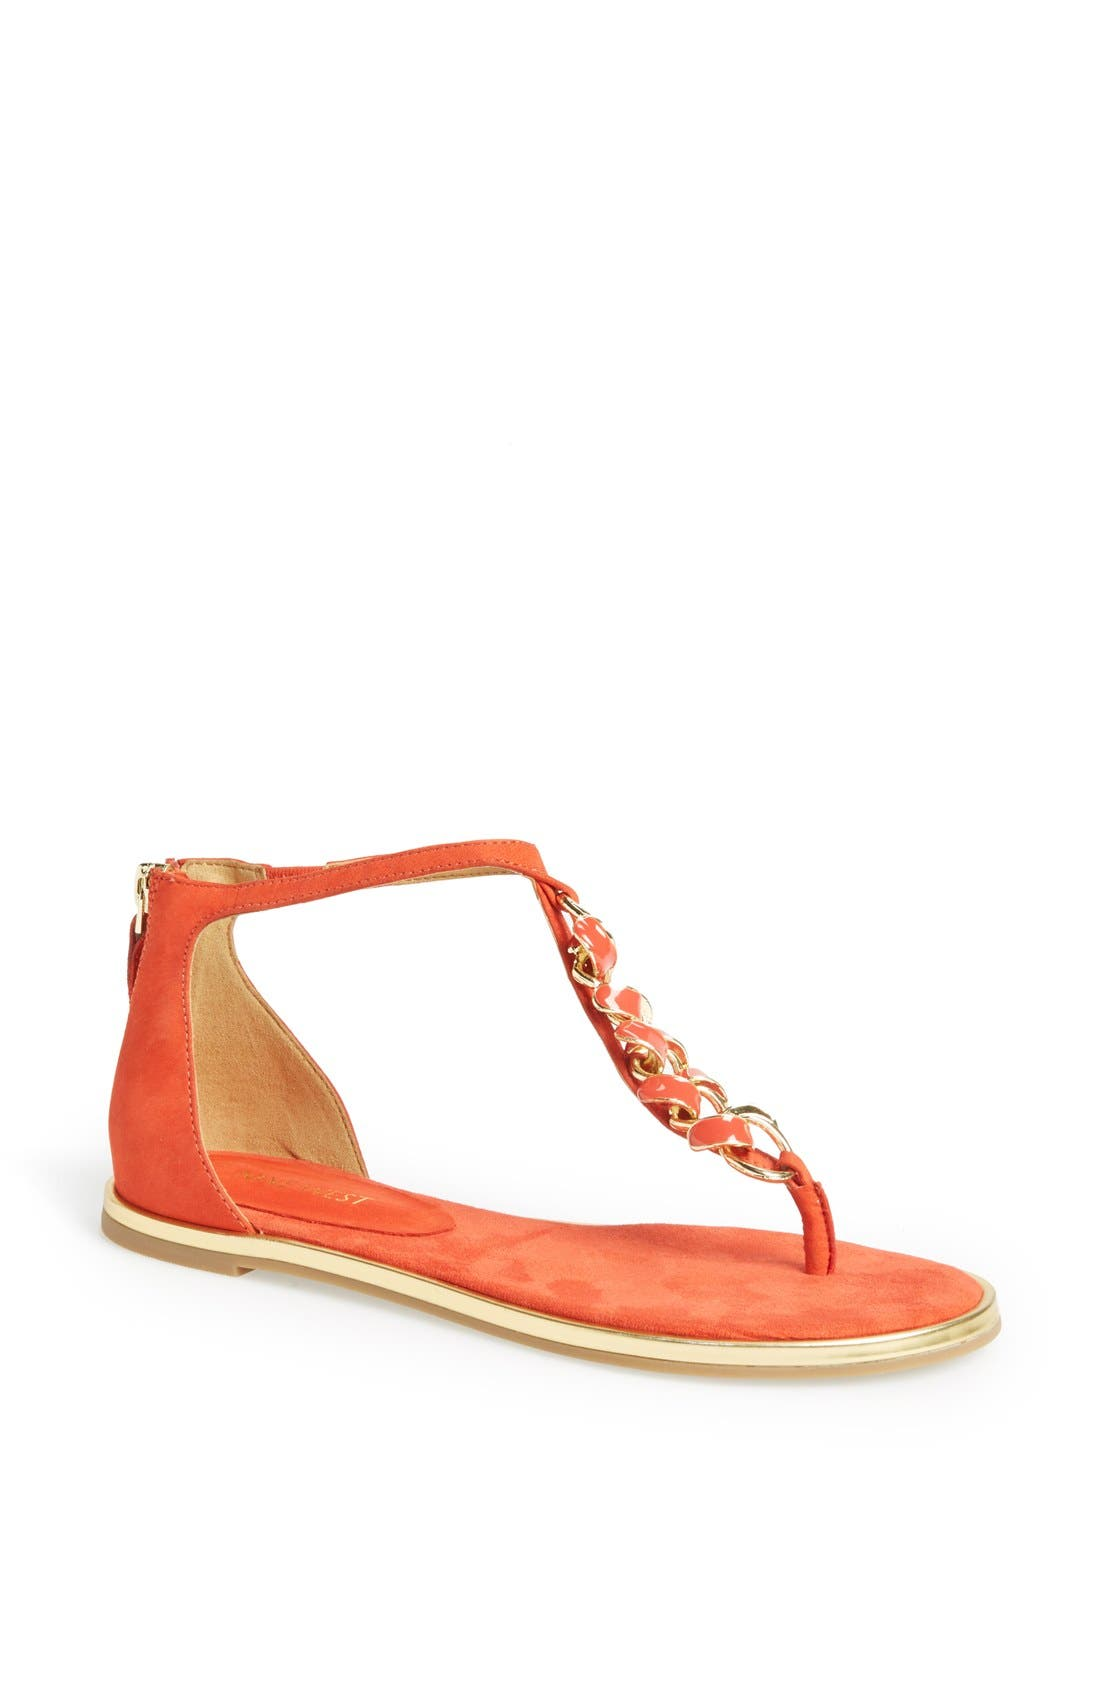 Main Image - Nine West 'Key Lime' Sandal